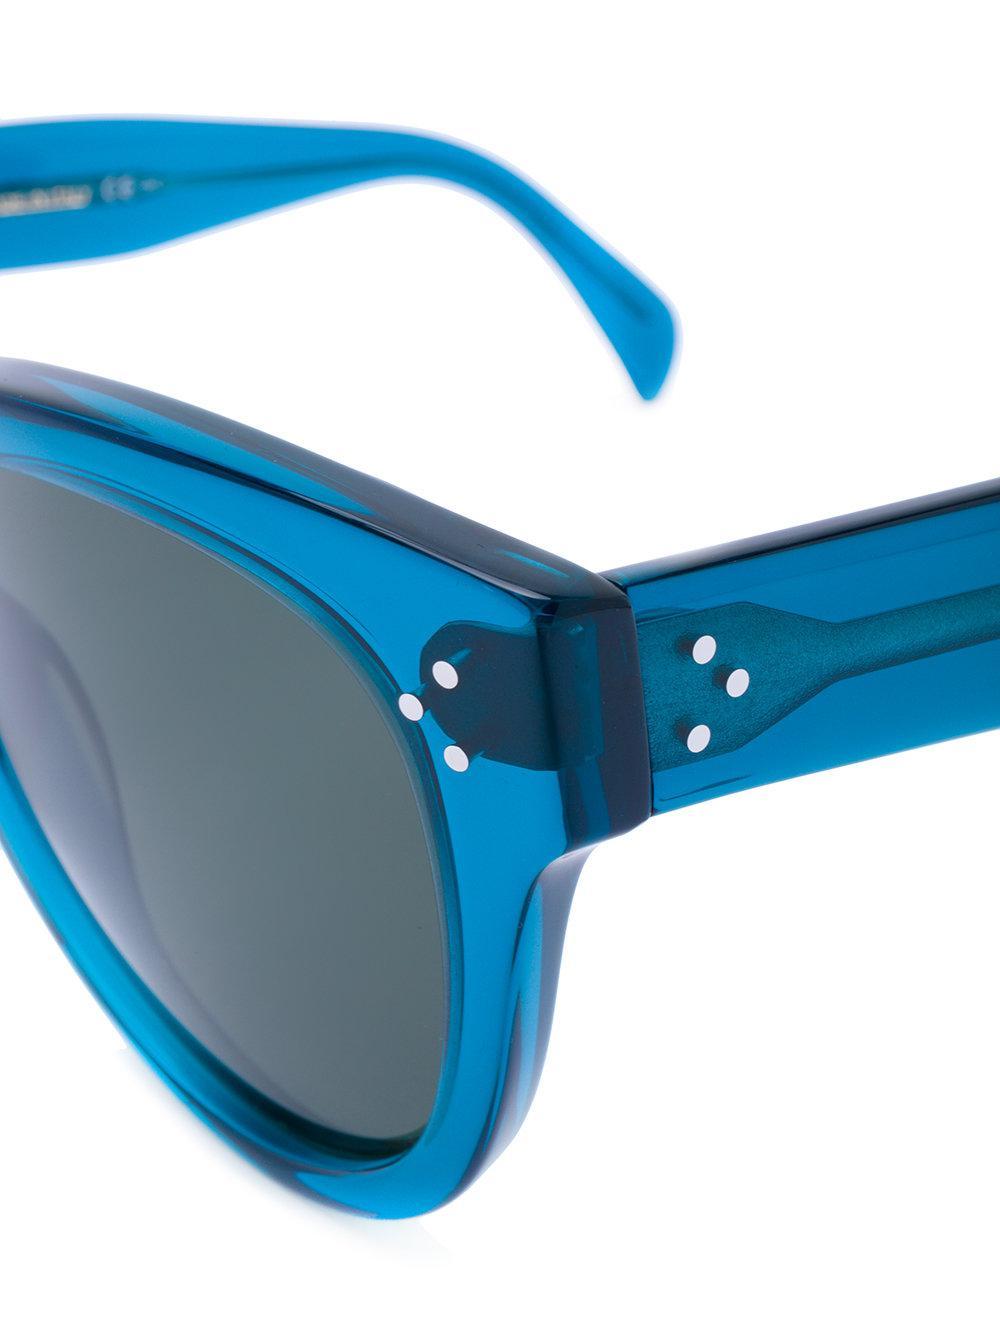 Celine Audrey Sunglasses in Blue